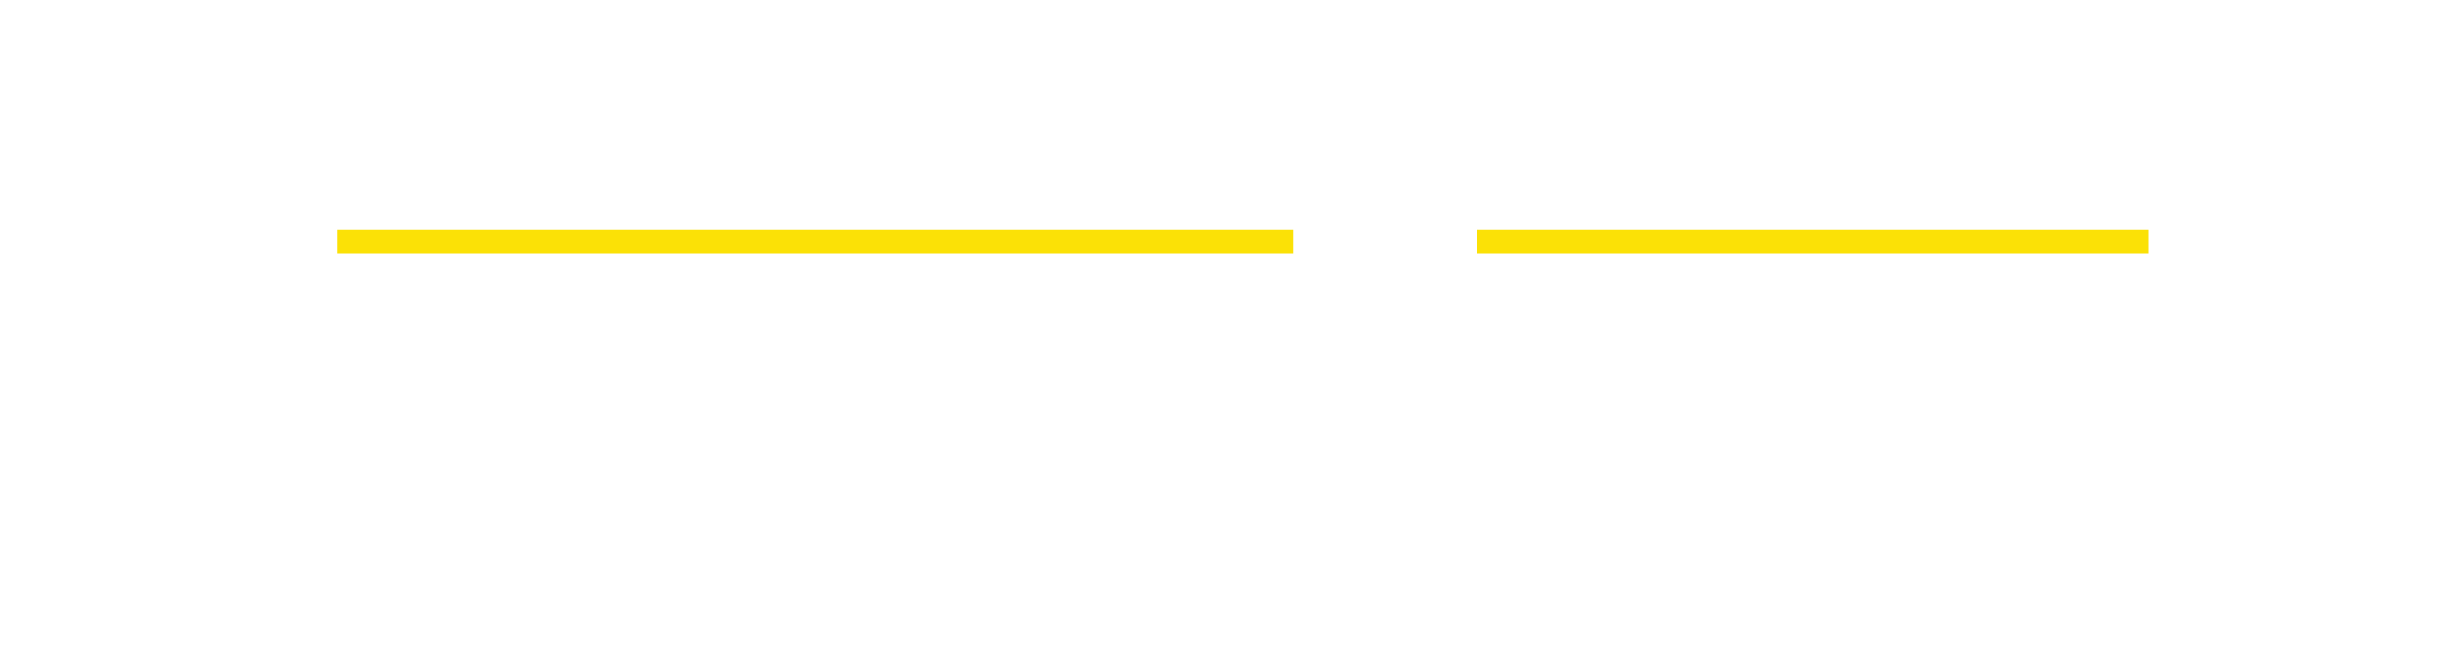 tdfoh_logo